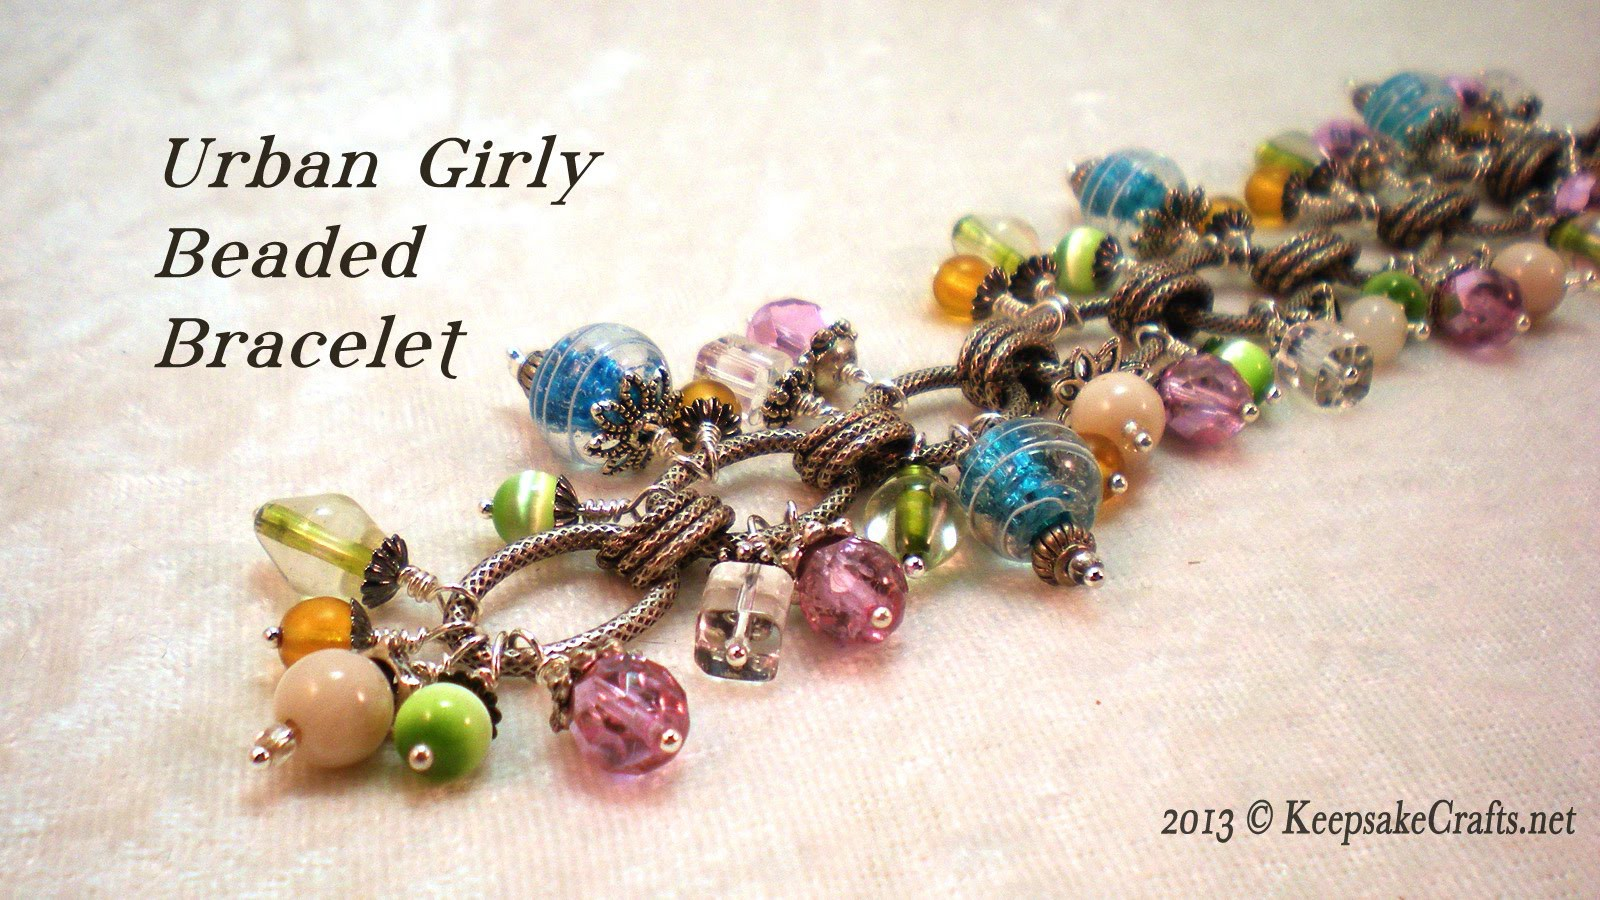 Urban Girly Bead Dangle Bracelet Video Tutorial